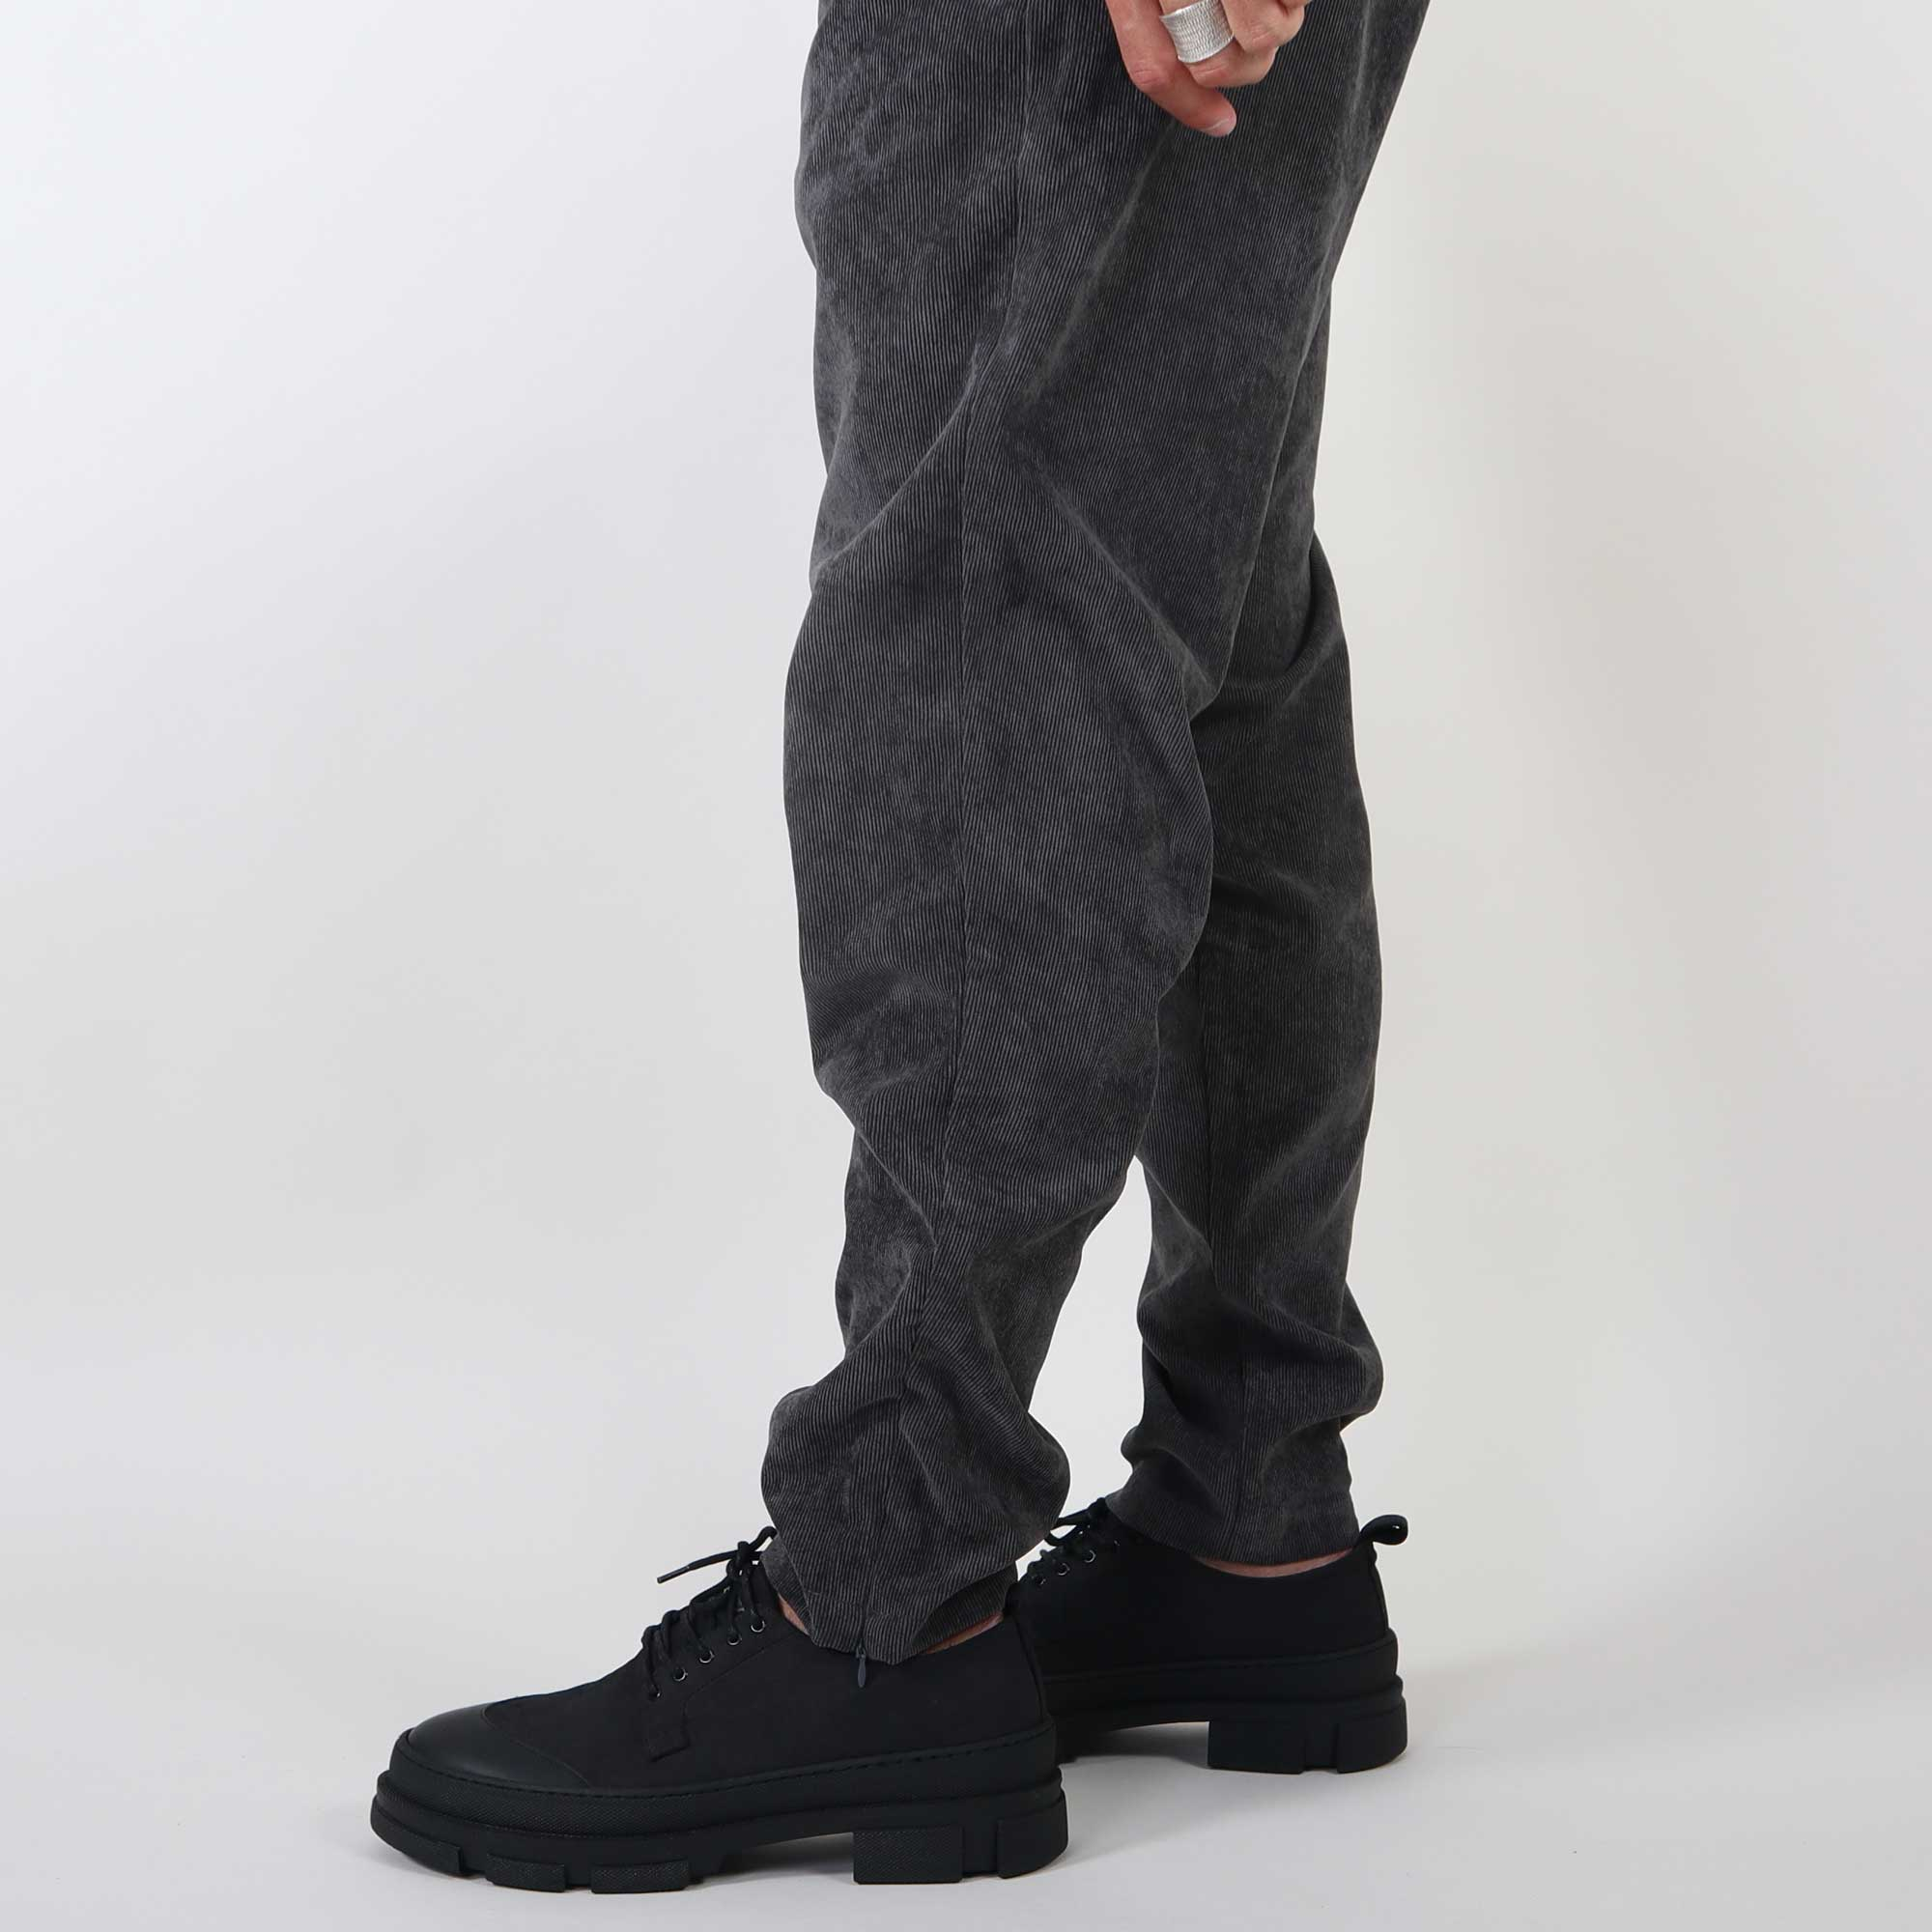 pantalon-rib-dgrey-1